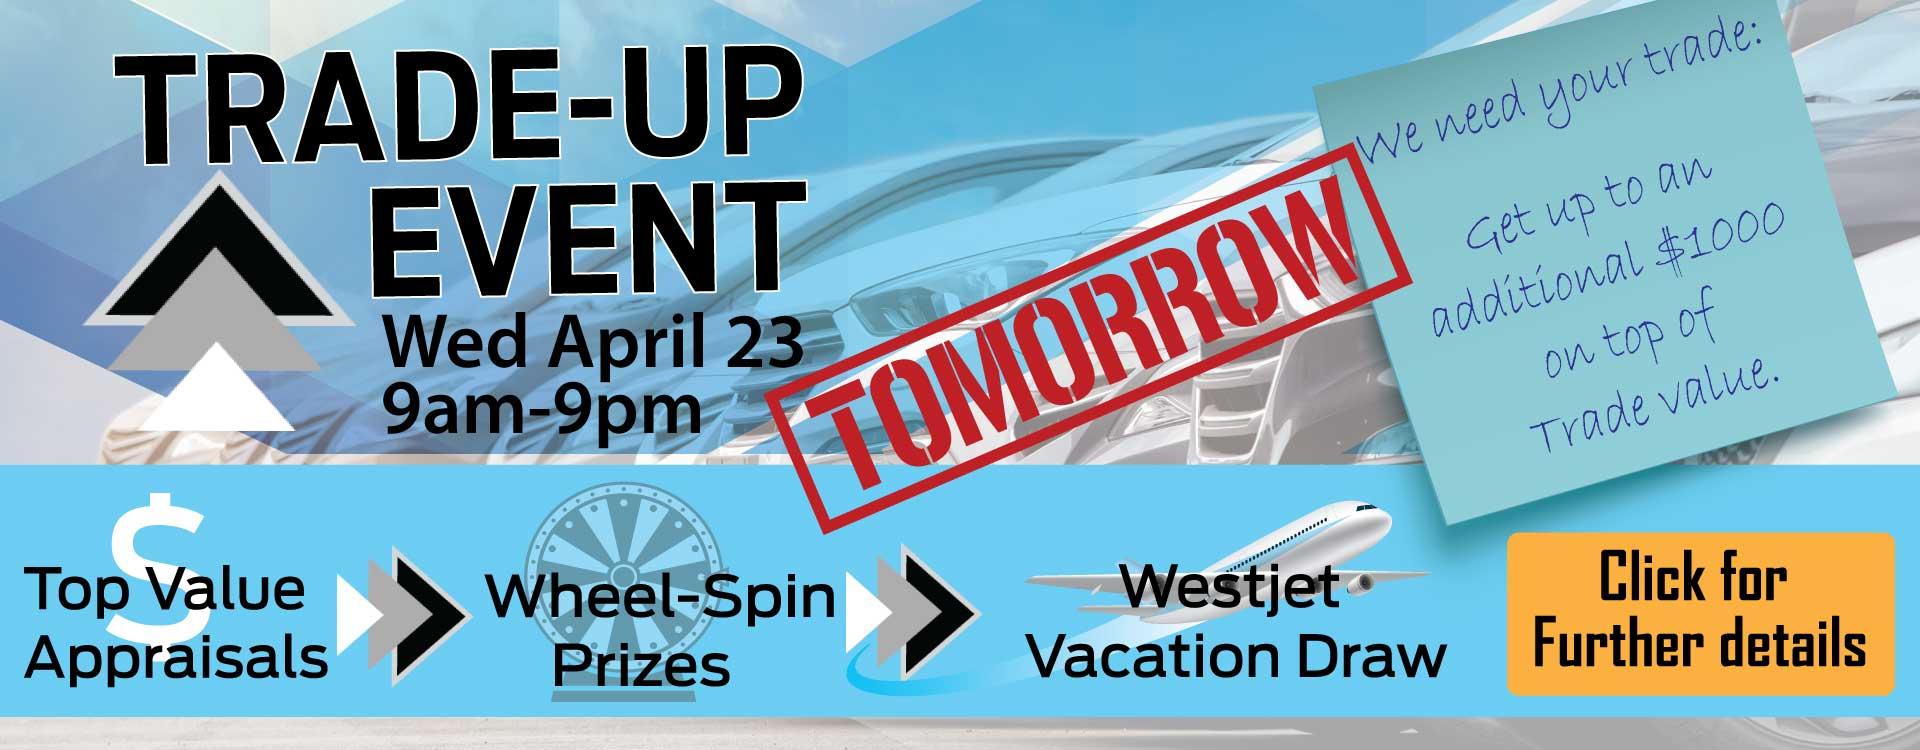 Advantage Ford - Trade Up Event - tomorrow